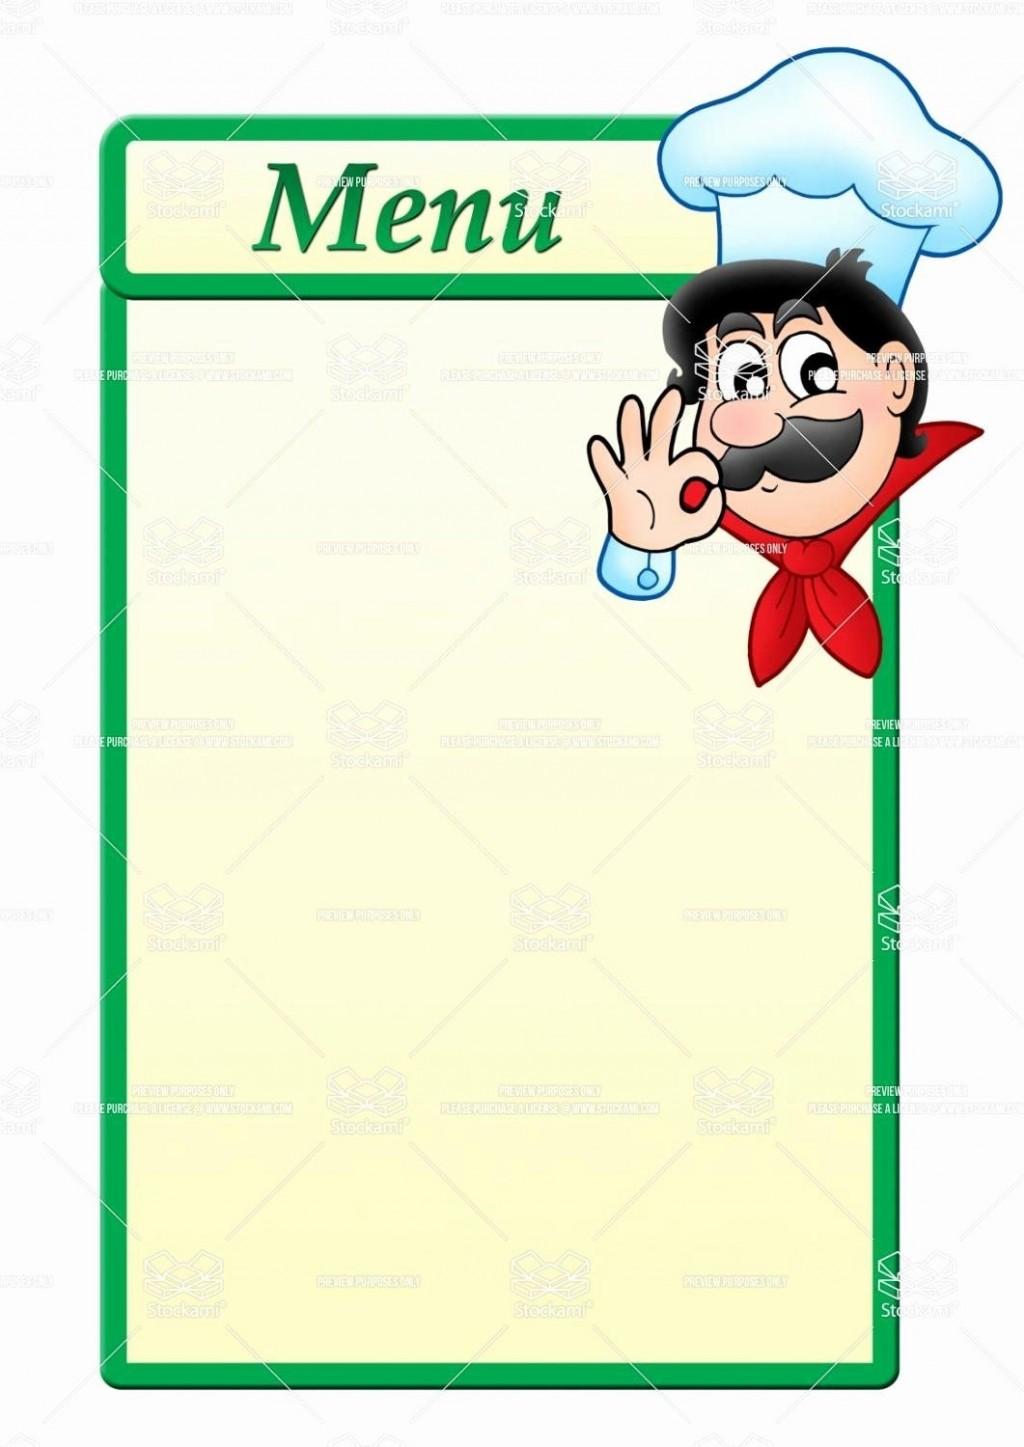 002 Simple Blank Restaurant Menu Template Photo  Free Printable DownloadableLarge